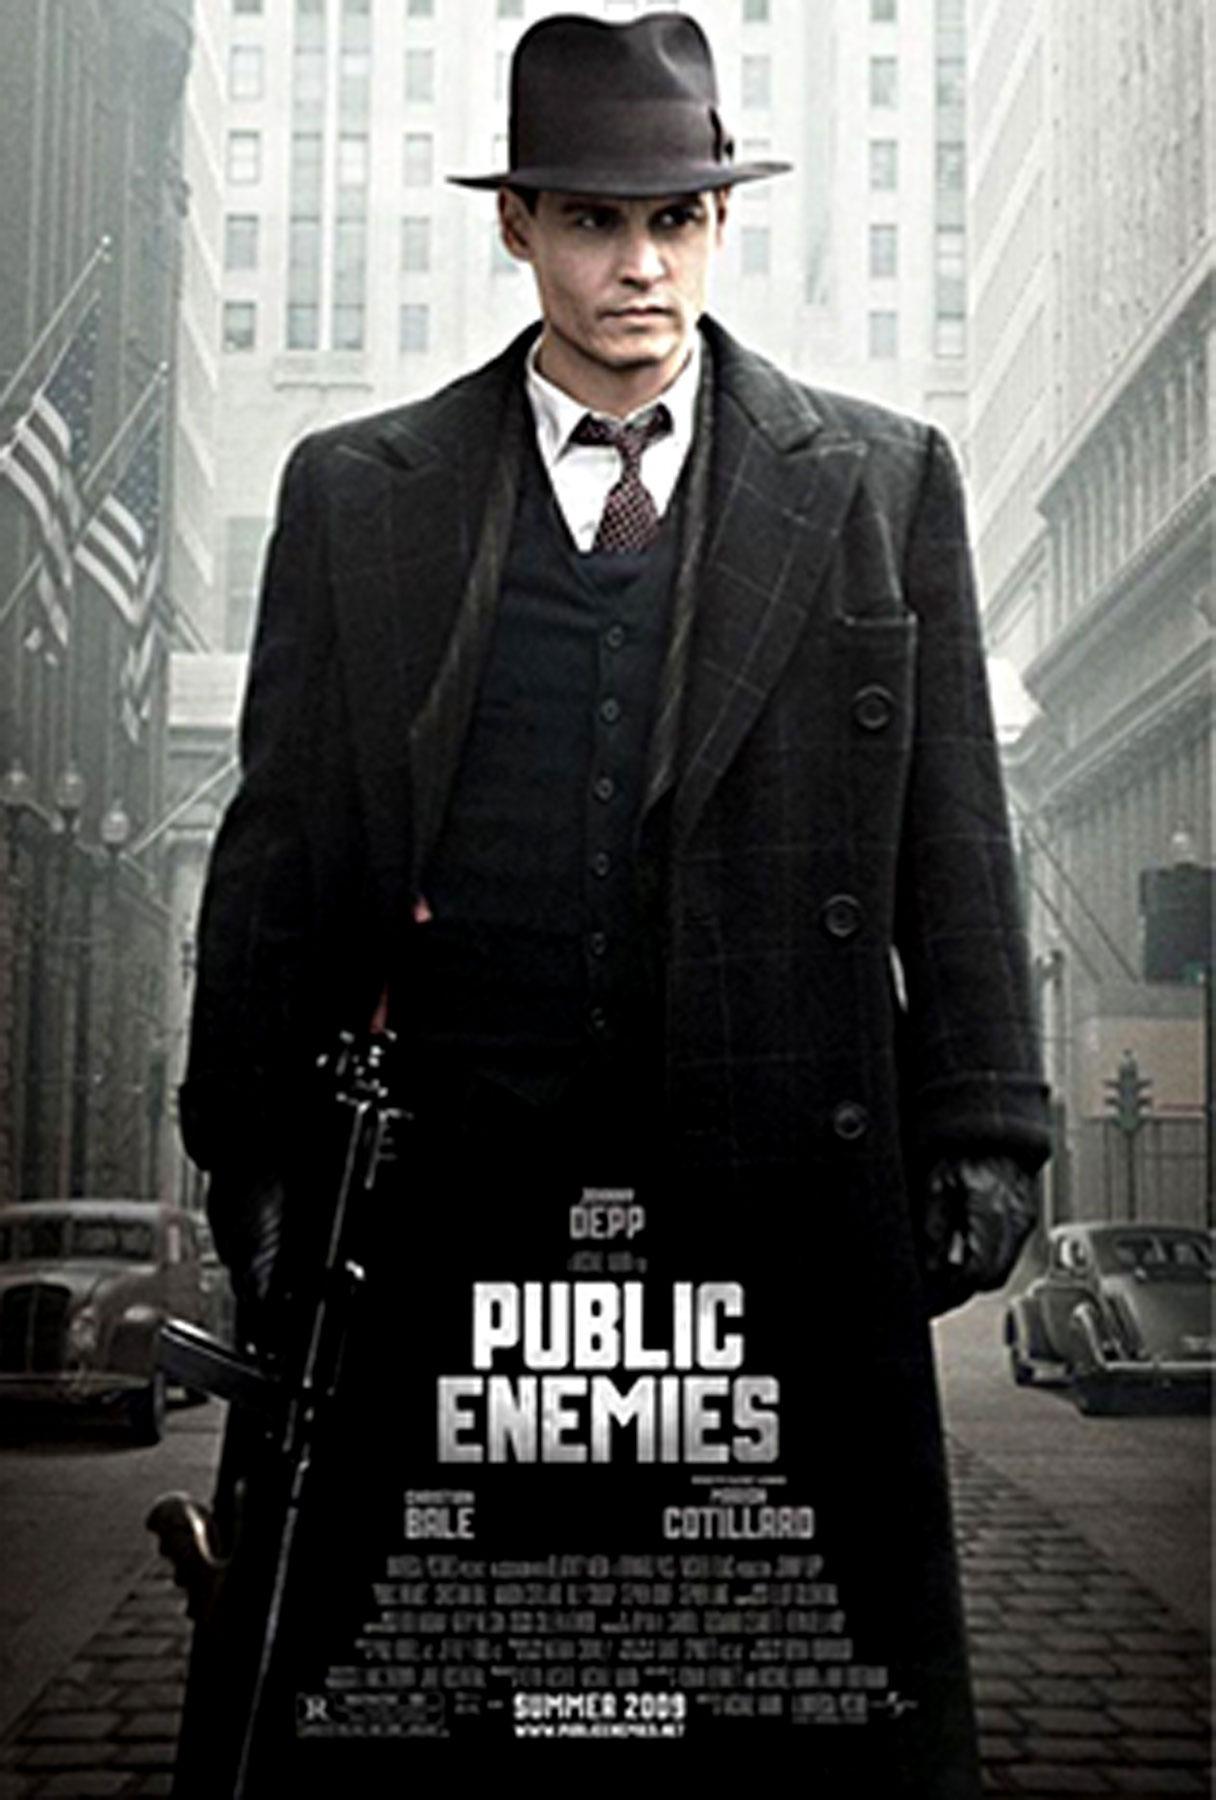 Johnny Depp: Public Enemy #1